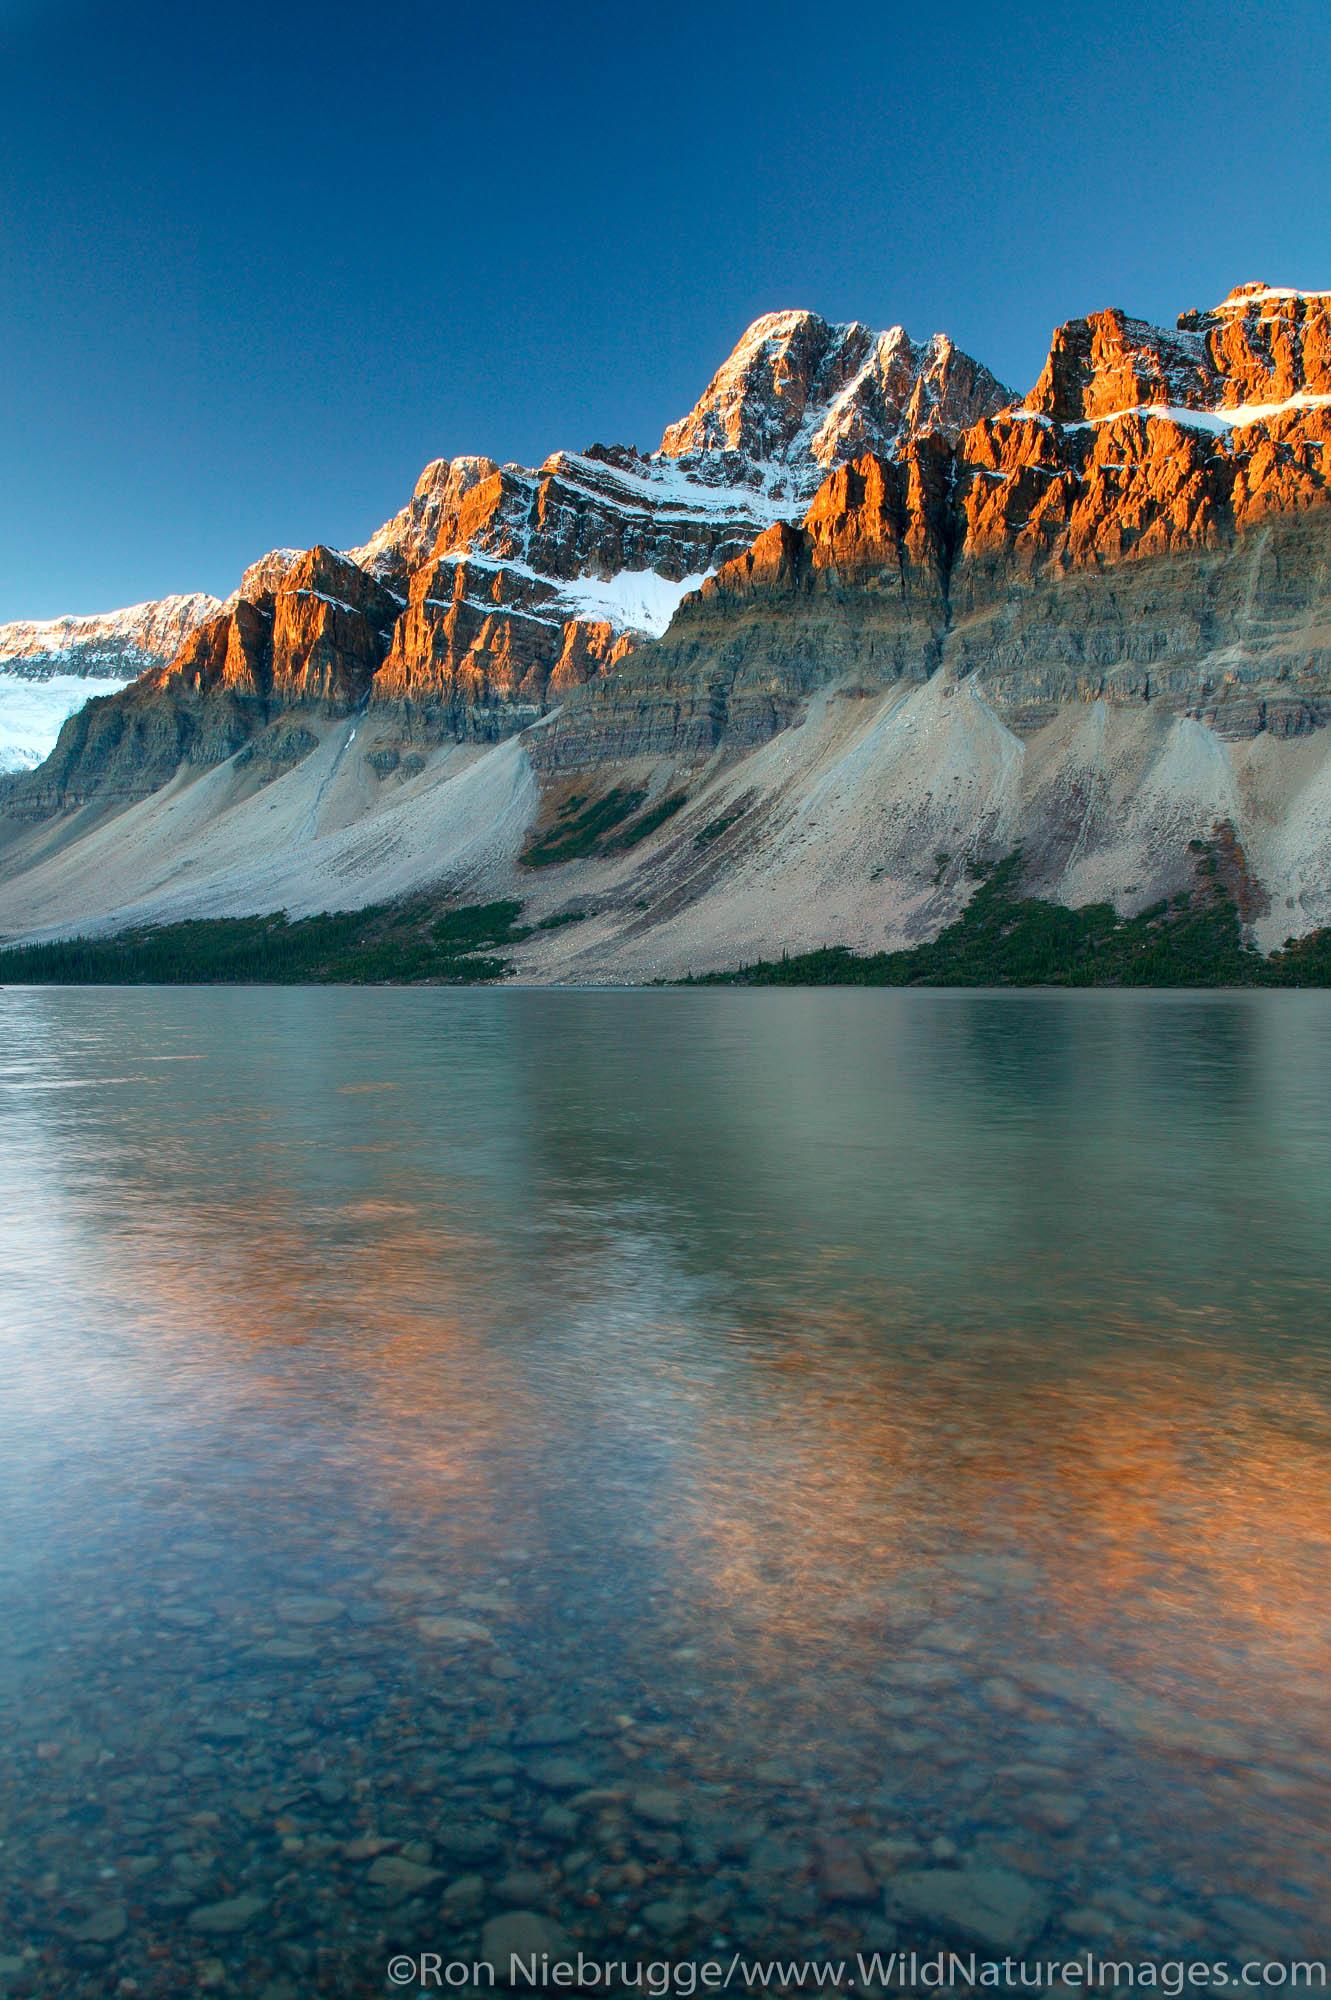 Crowfoot Mountain and Bow Lake at sunrise, Banff National Park, Alberta, Canada.